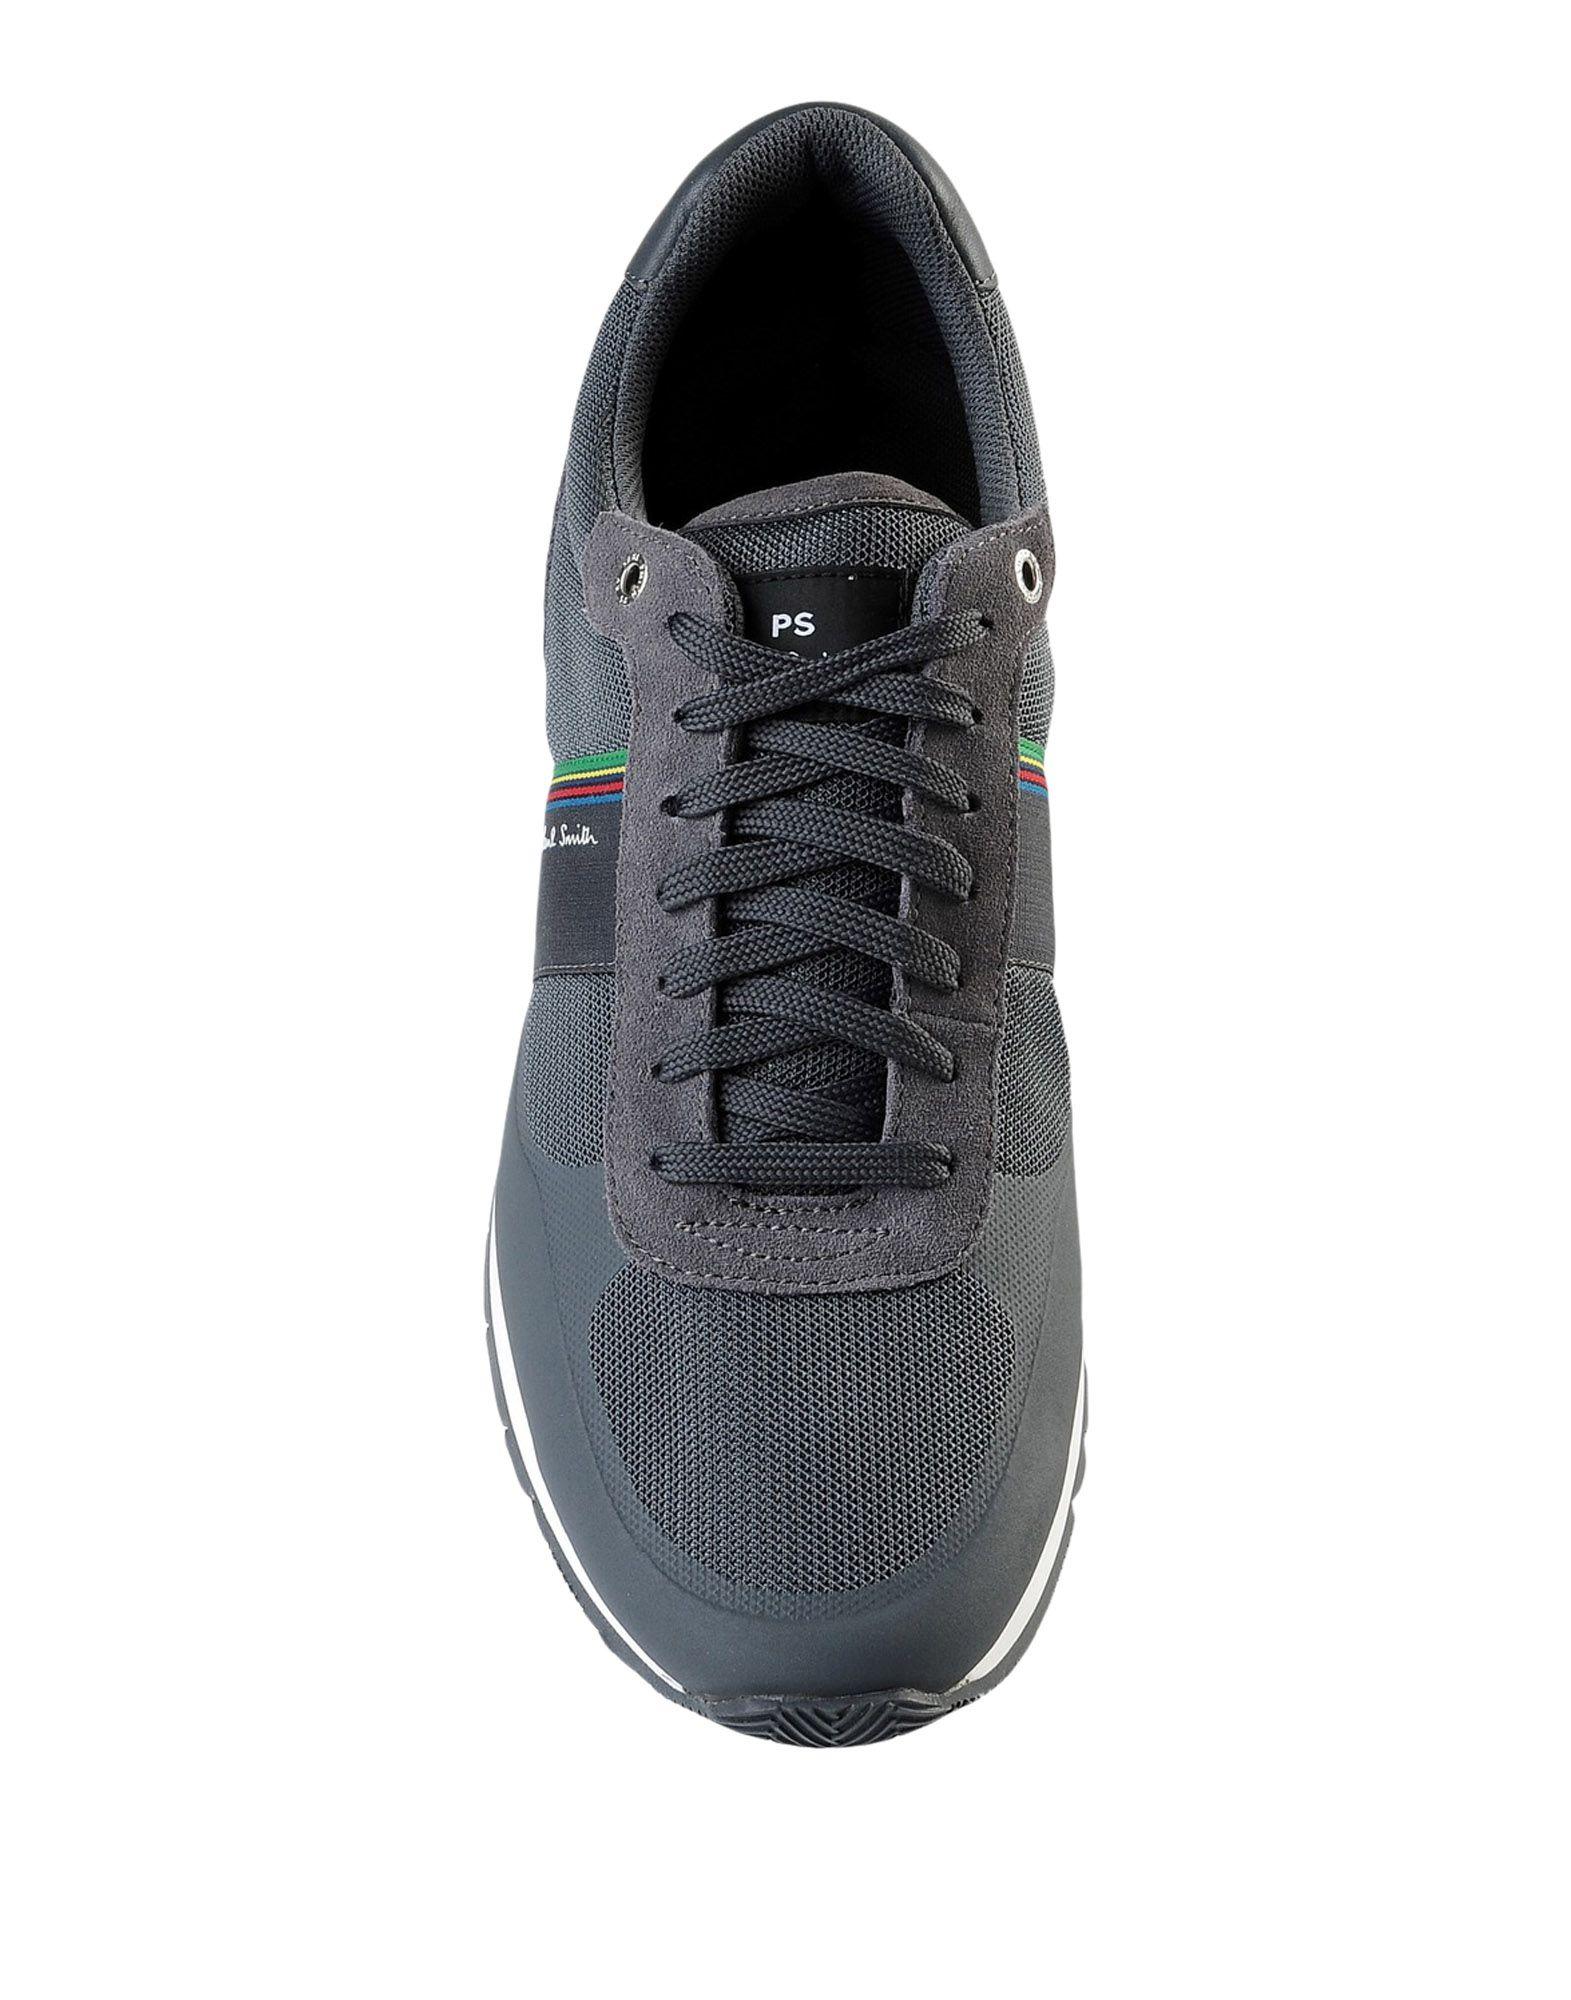 Ps By Paul Smith Sneakers Herren beliebte  11538470JJ Gute Qualität beliebte Herren Schuhe dd0ad4